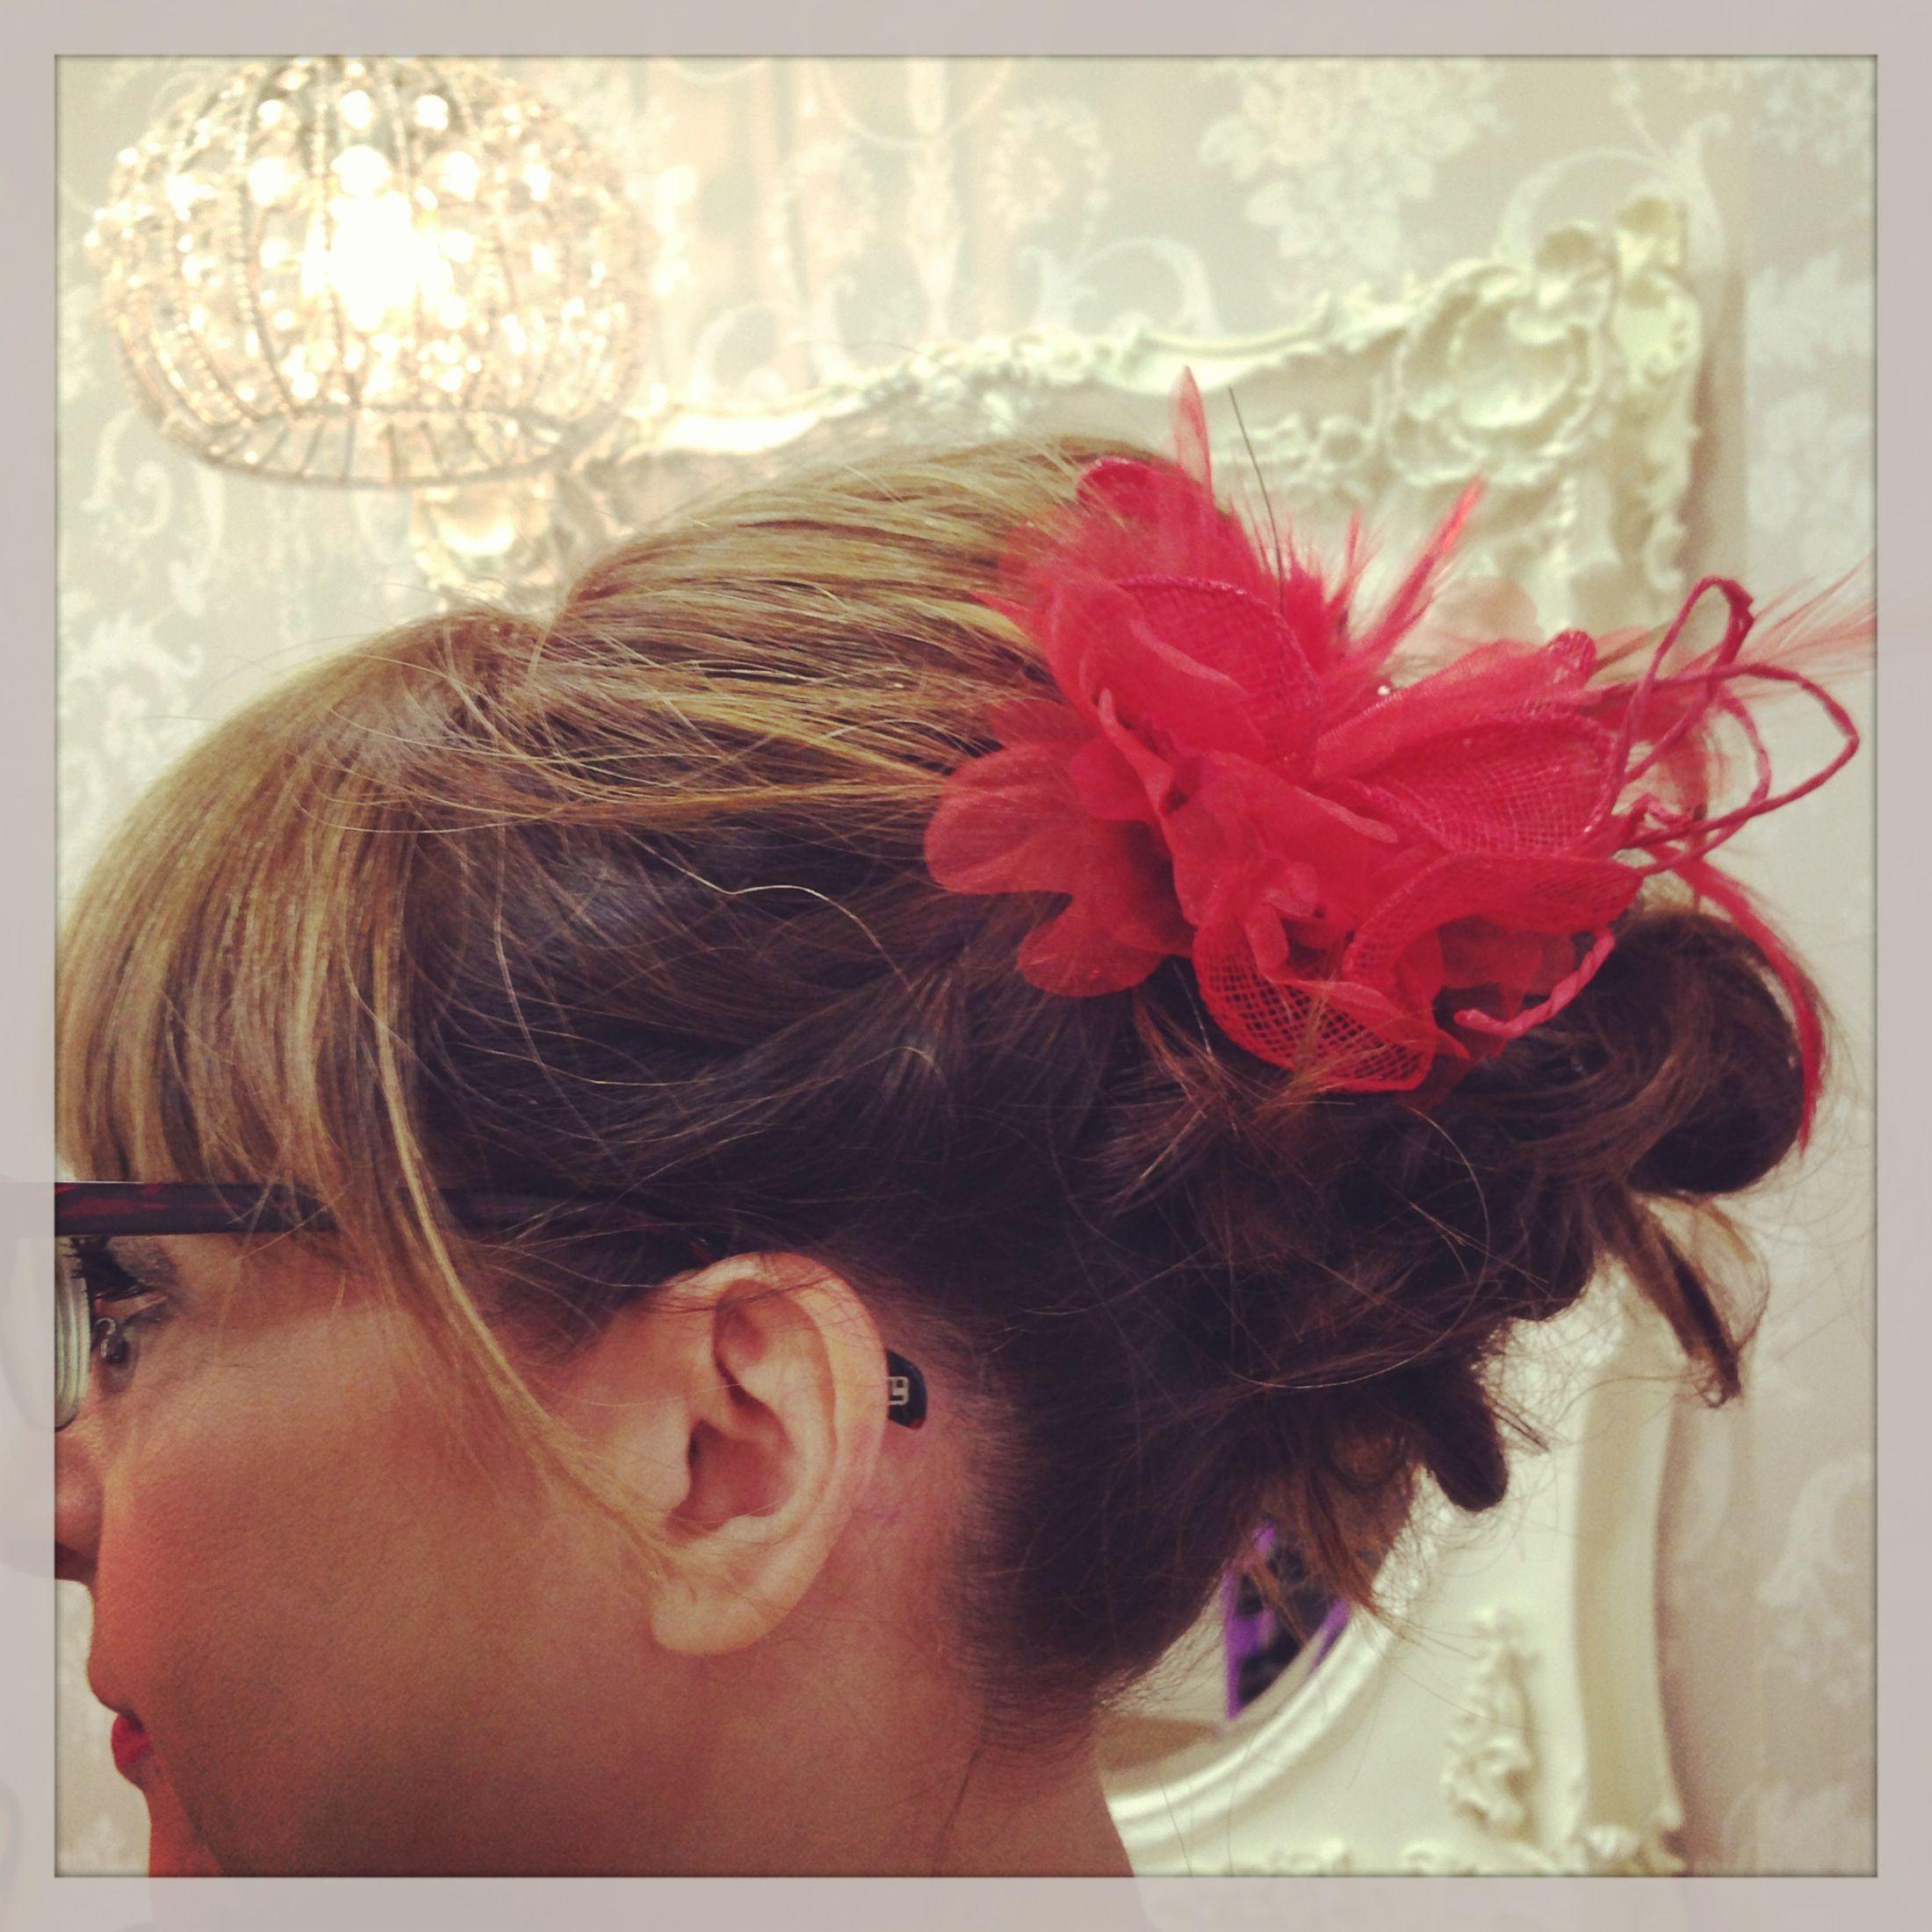 Recogido chuli chuli!! Eva Pellejero Expertas en Novias!!! Eva Pellejero Beauty Salon, Sanclemente 7-9, 50001 Zaragoza Telf.976795152 #novias #beauty #beautysalon #evapellejero